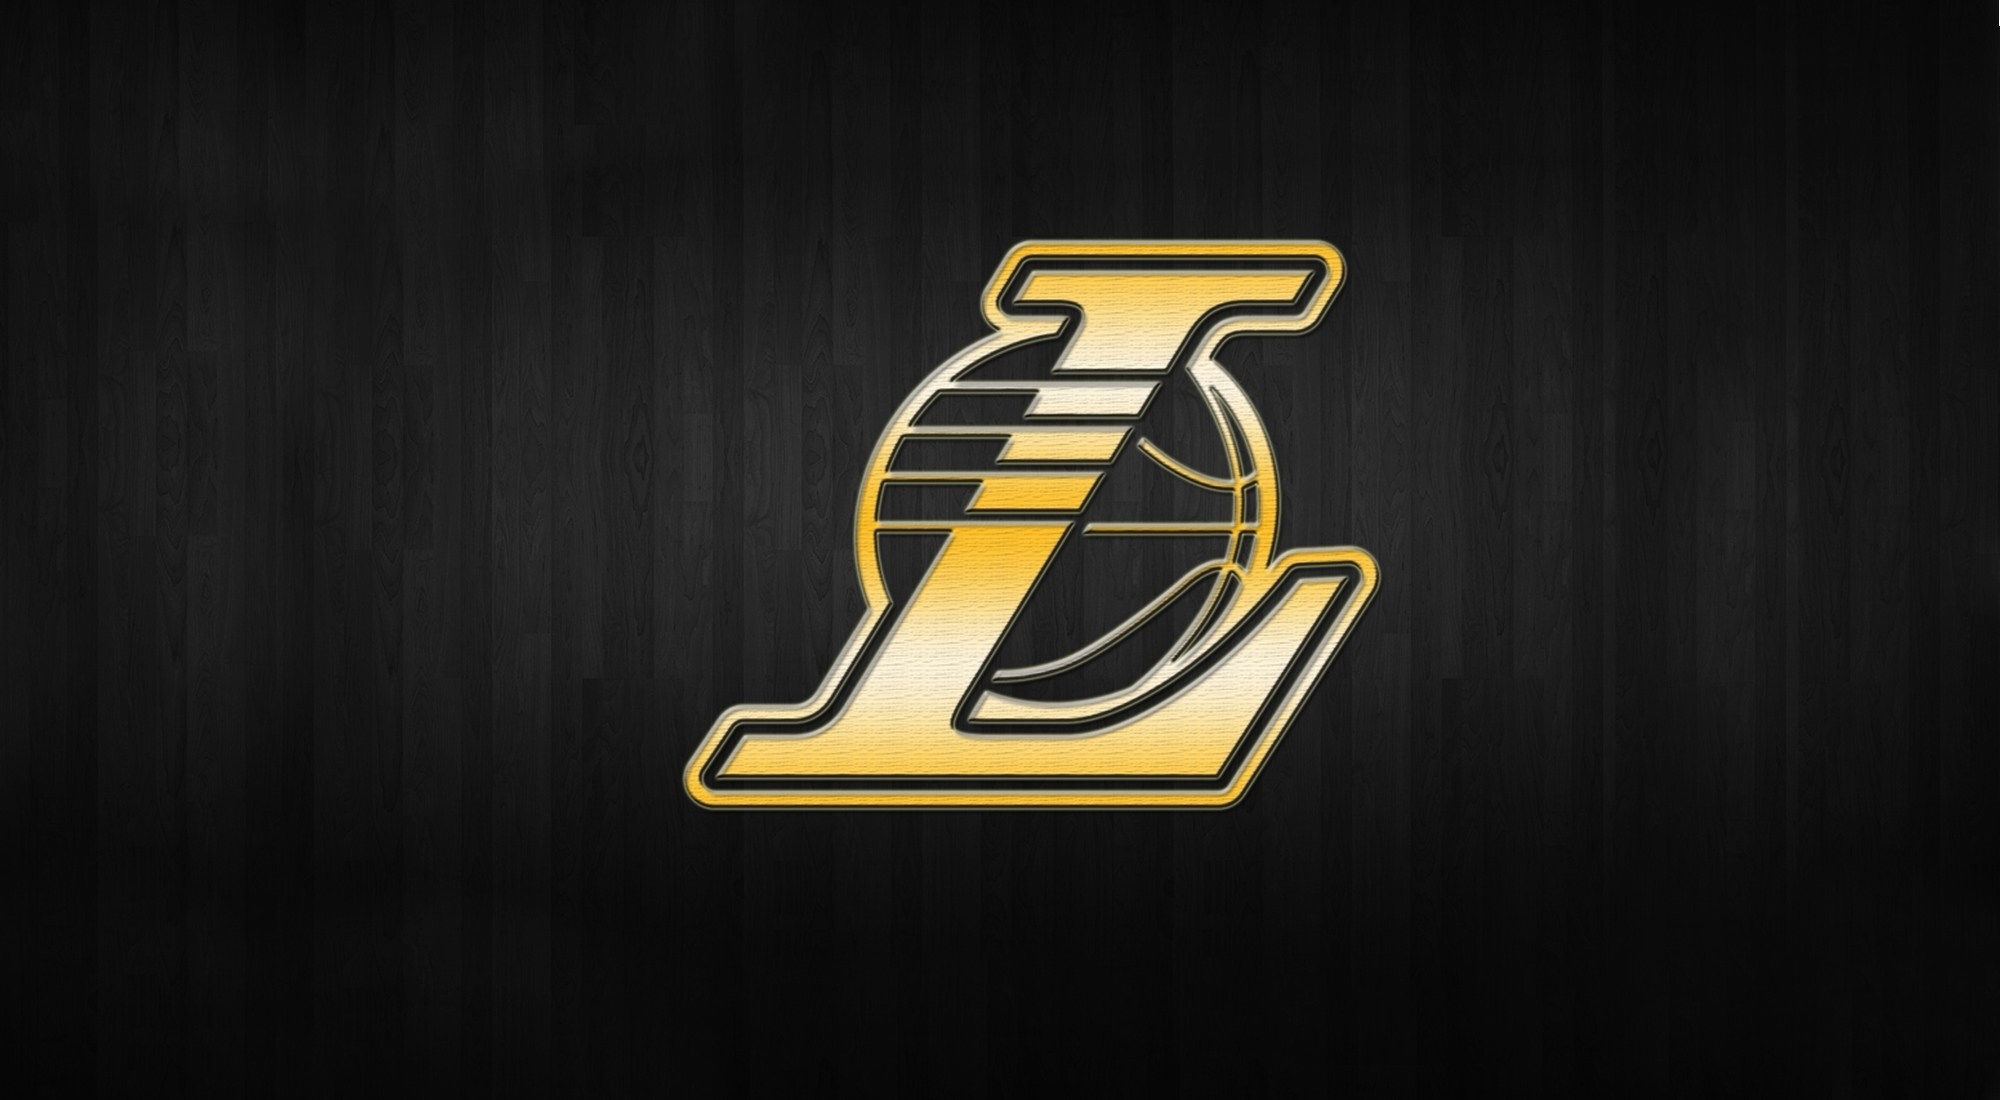 110253 скачать обои Спорт, Los Angeles, Lakers, Нба, Логотип, Фон, Золото - заставки и картинки бесплатно